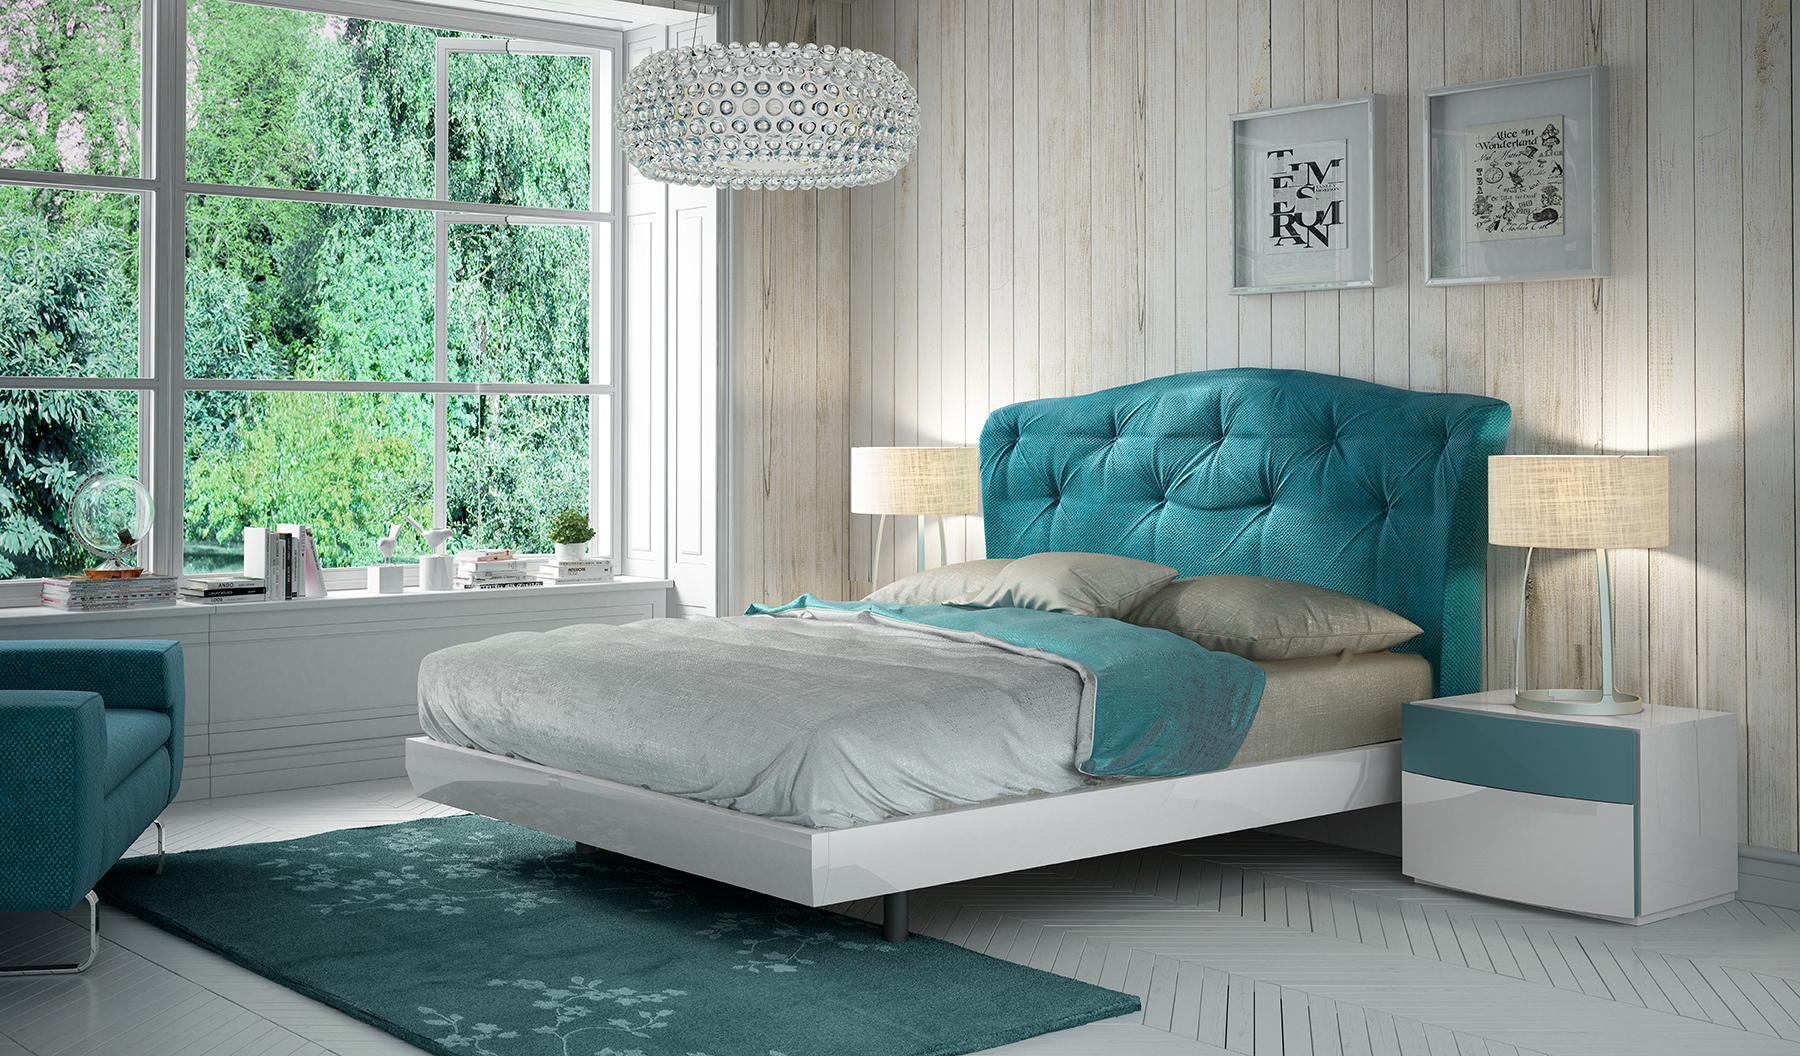 Picture of: Fabric Upholstered Unique Quality Elite Platform Bed Phoenix Arizona Fenicia Spain Composition 5